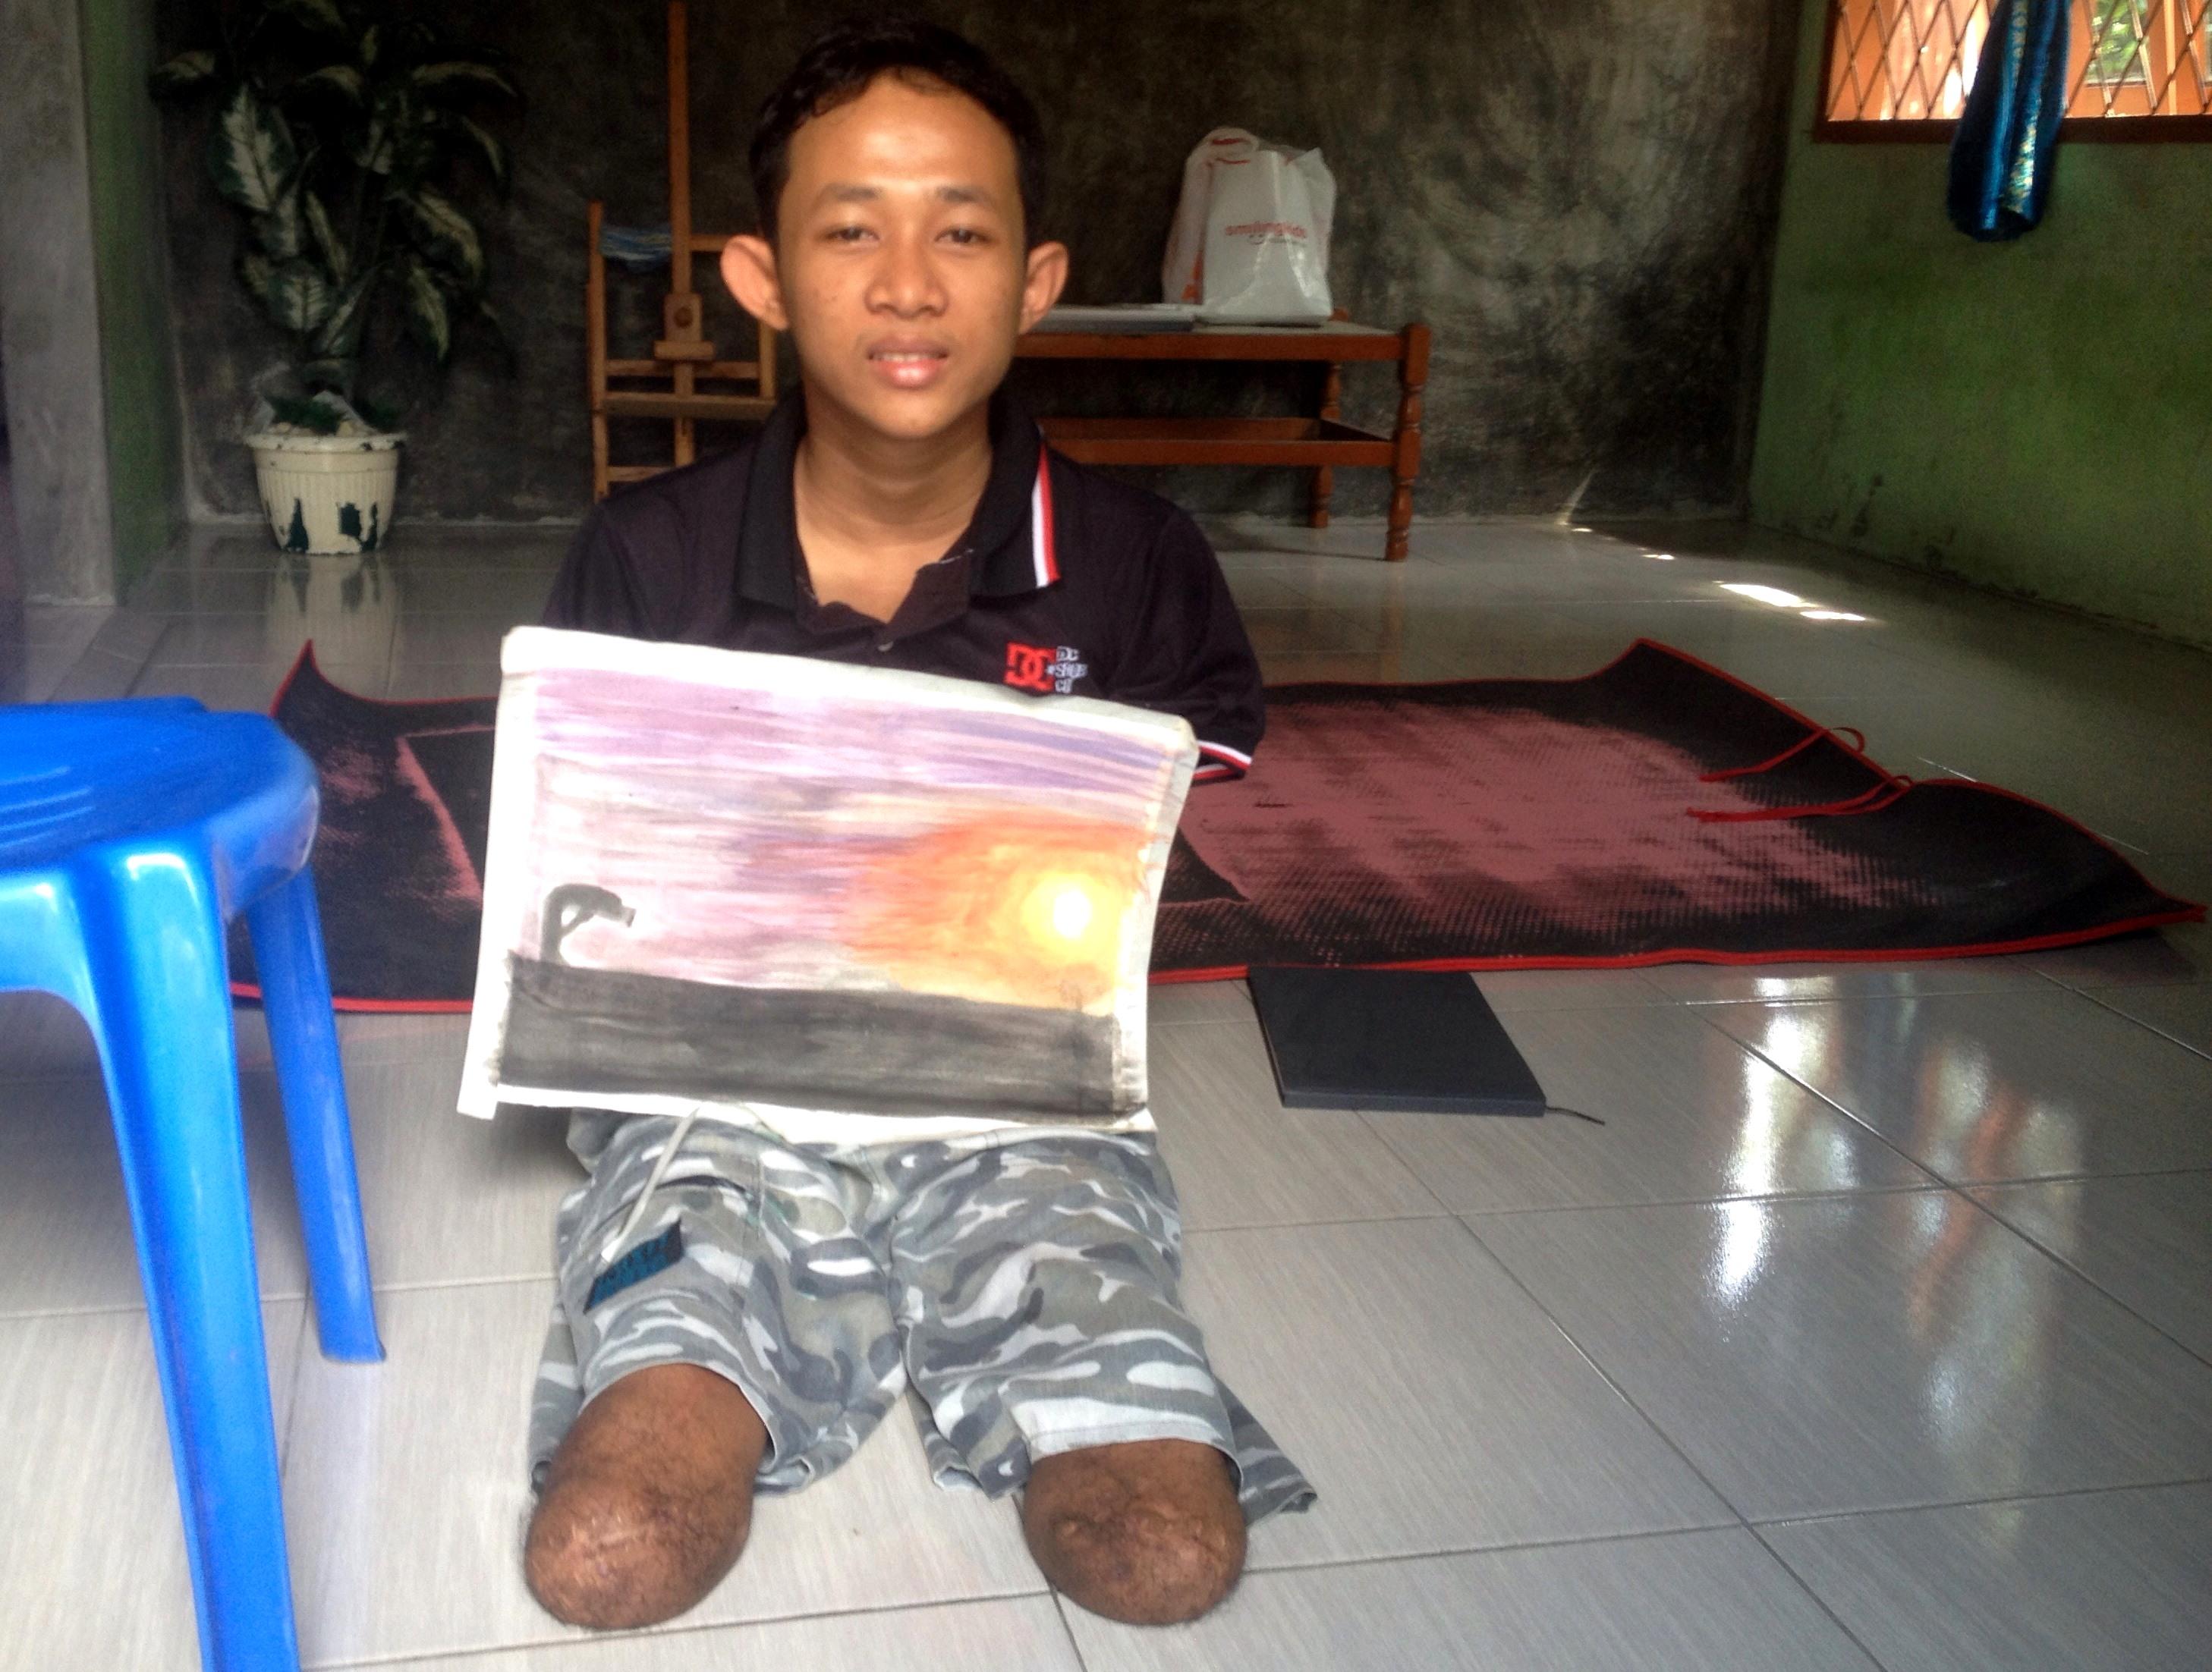 Kehilangan tangan dan kaki, remaja ini bangkit dan menjadi pelukis